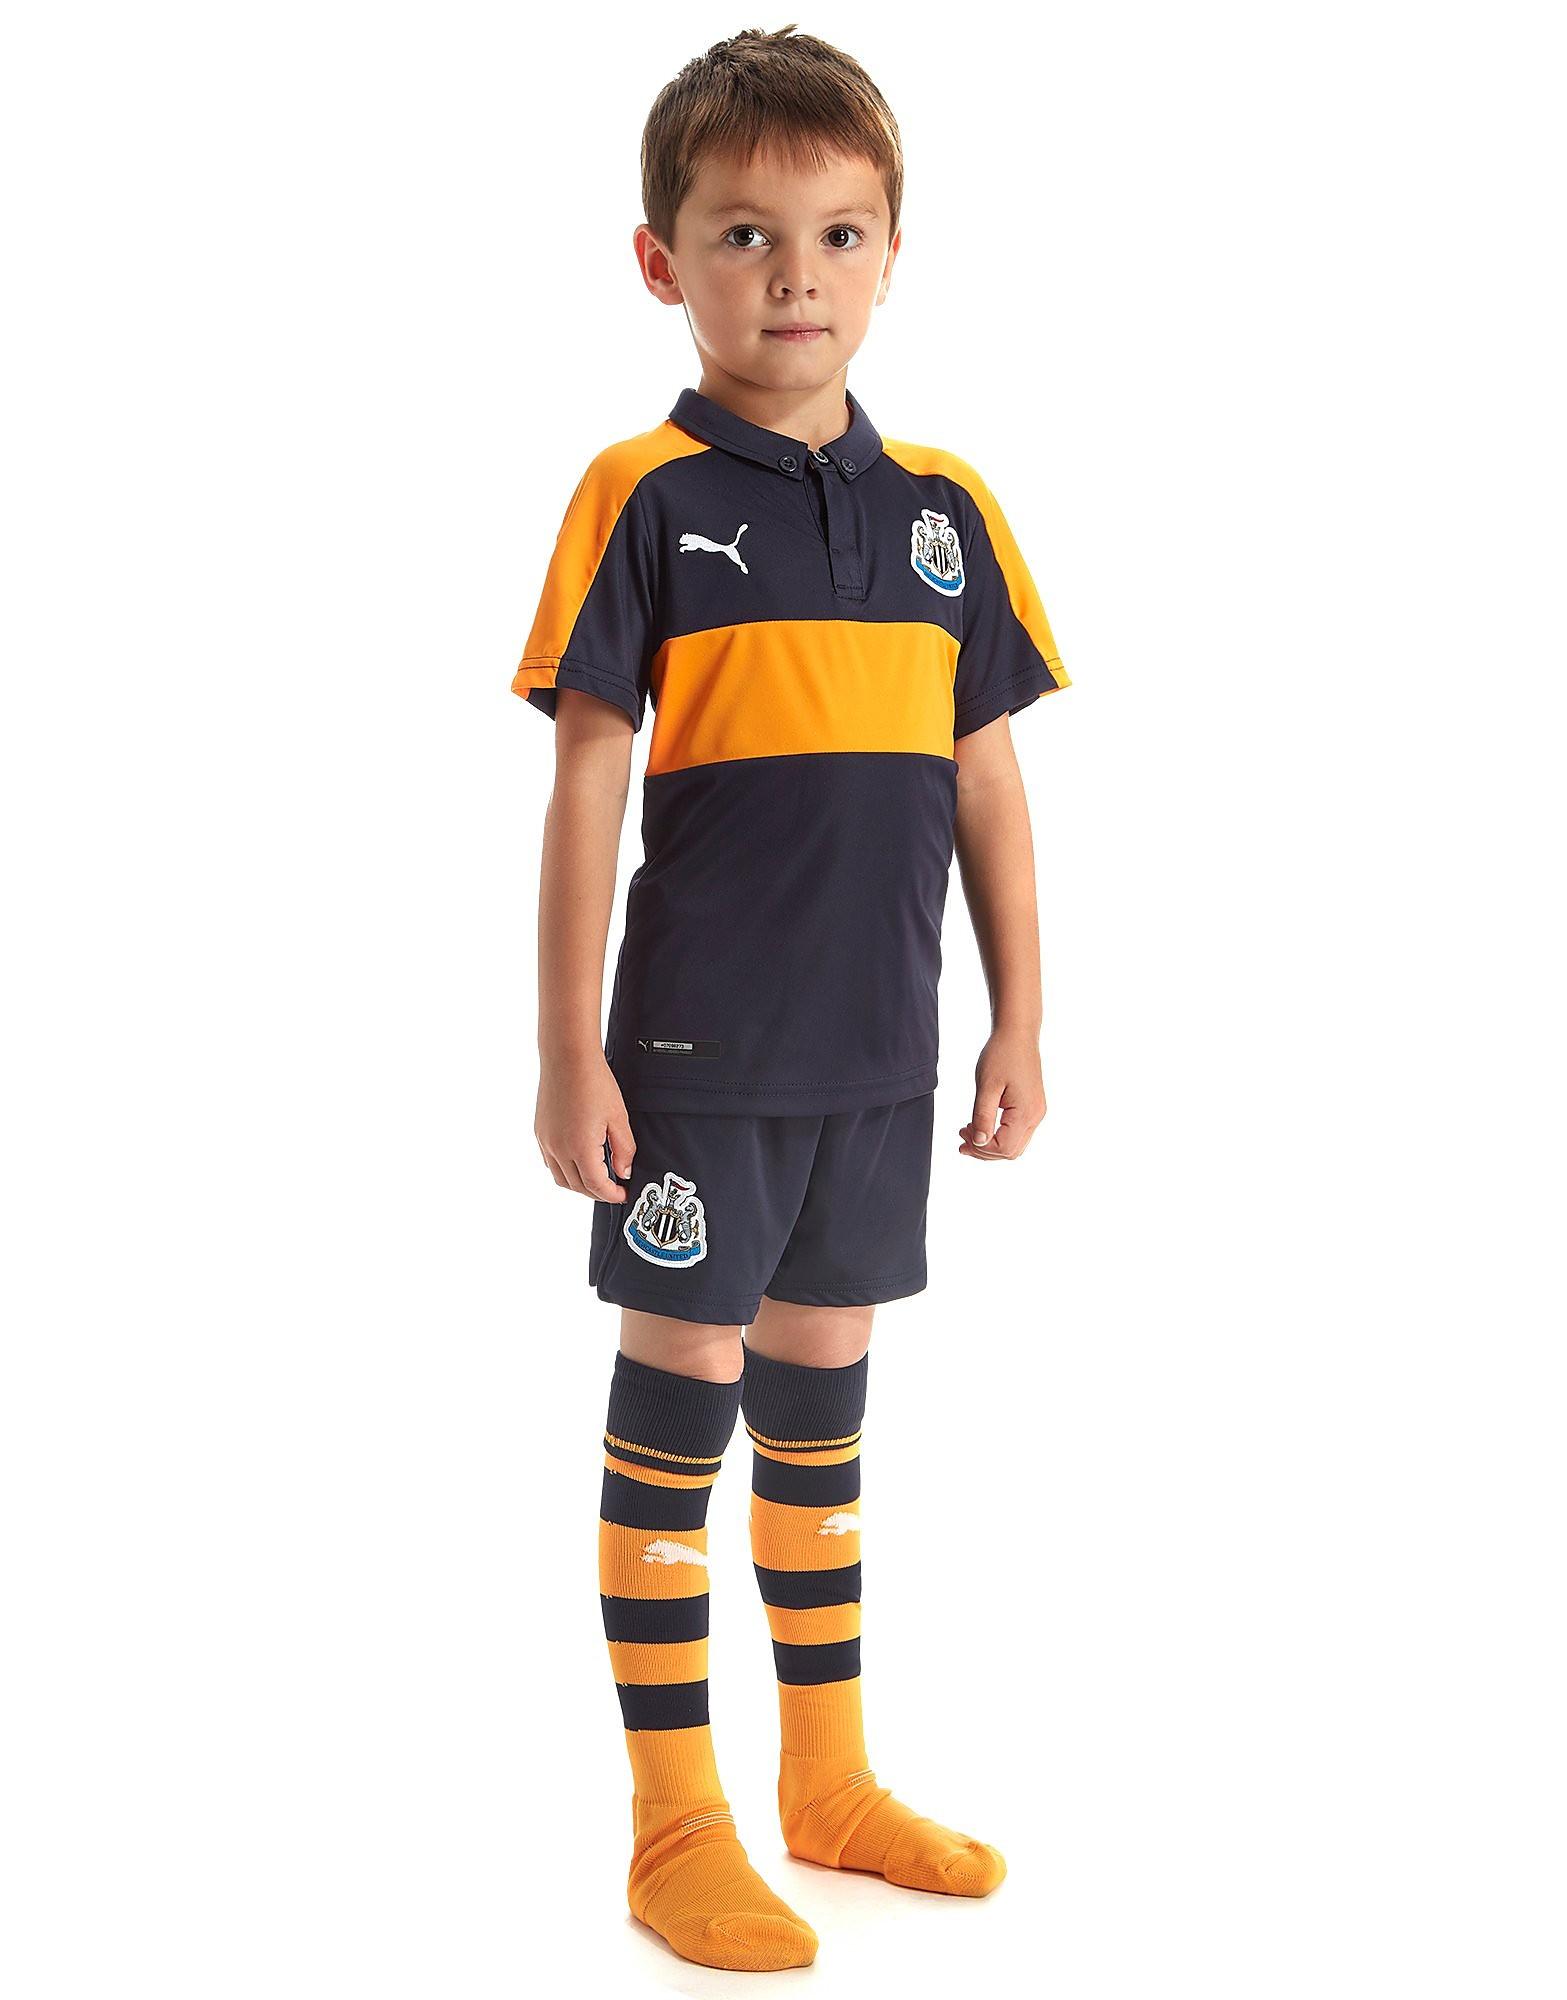 PUMA Newcastle United 2016/17 Away Kit Children